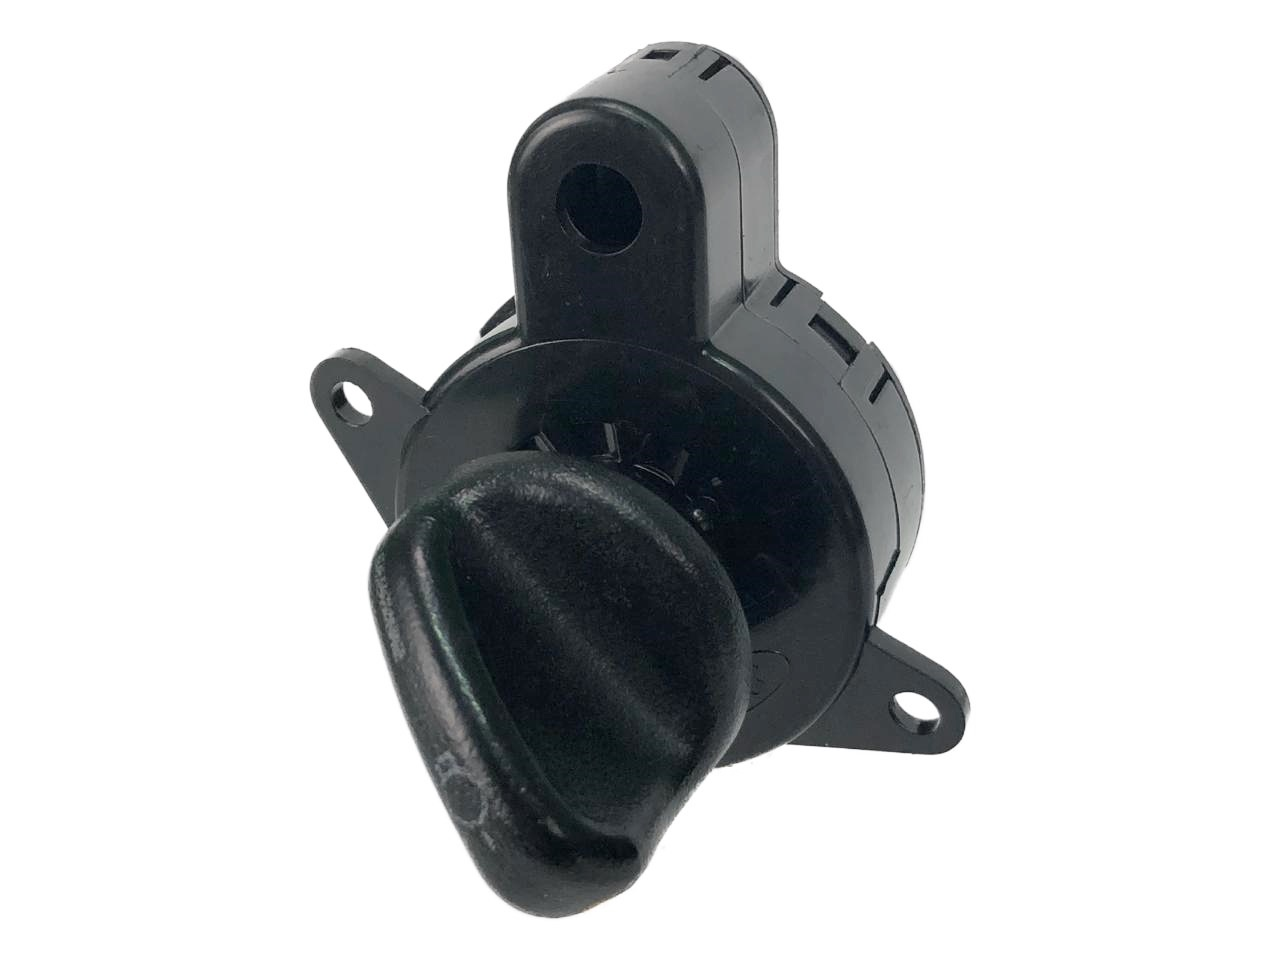 Chave Botão do Painel Interruptor de Lanterna Farol F87B11654AA Ford Ranger 05 06 07 08 09